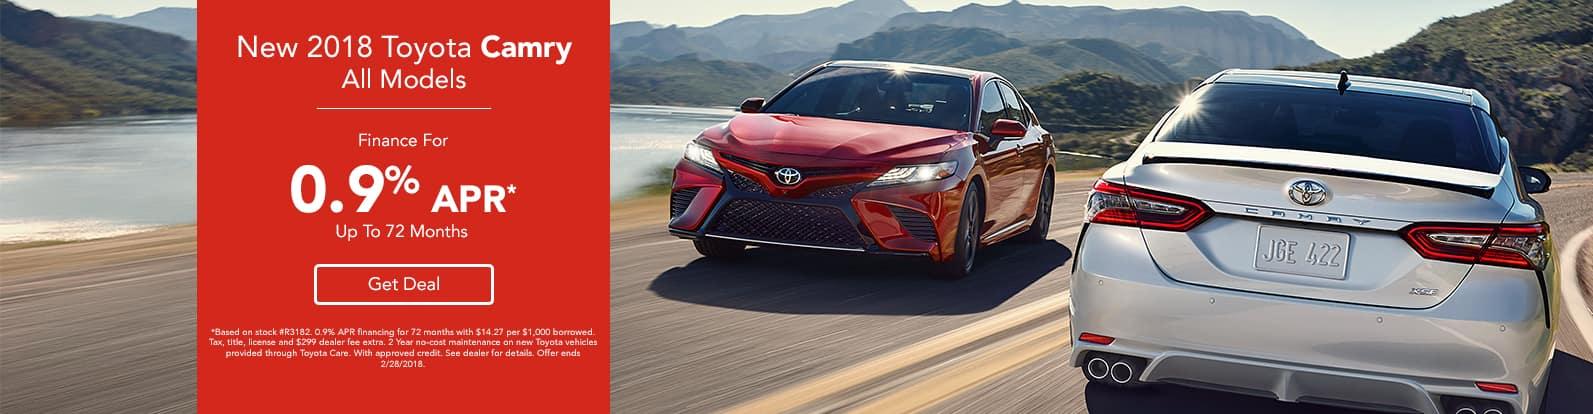 Baxter Toyota Omaha >> Baxter Toyota La Vista | Toyota Sales in La Vista, NE